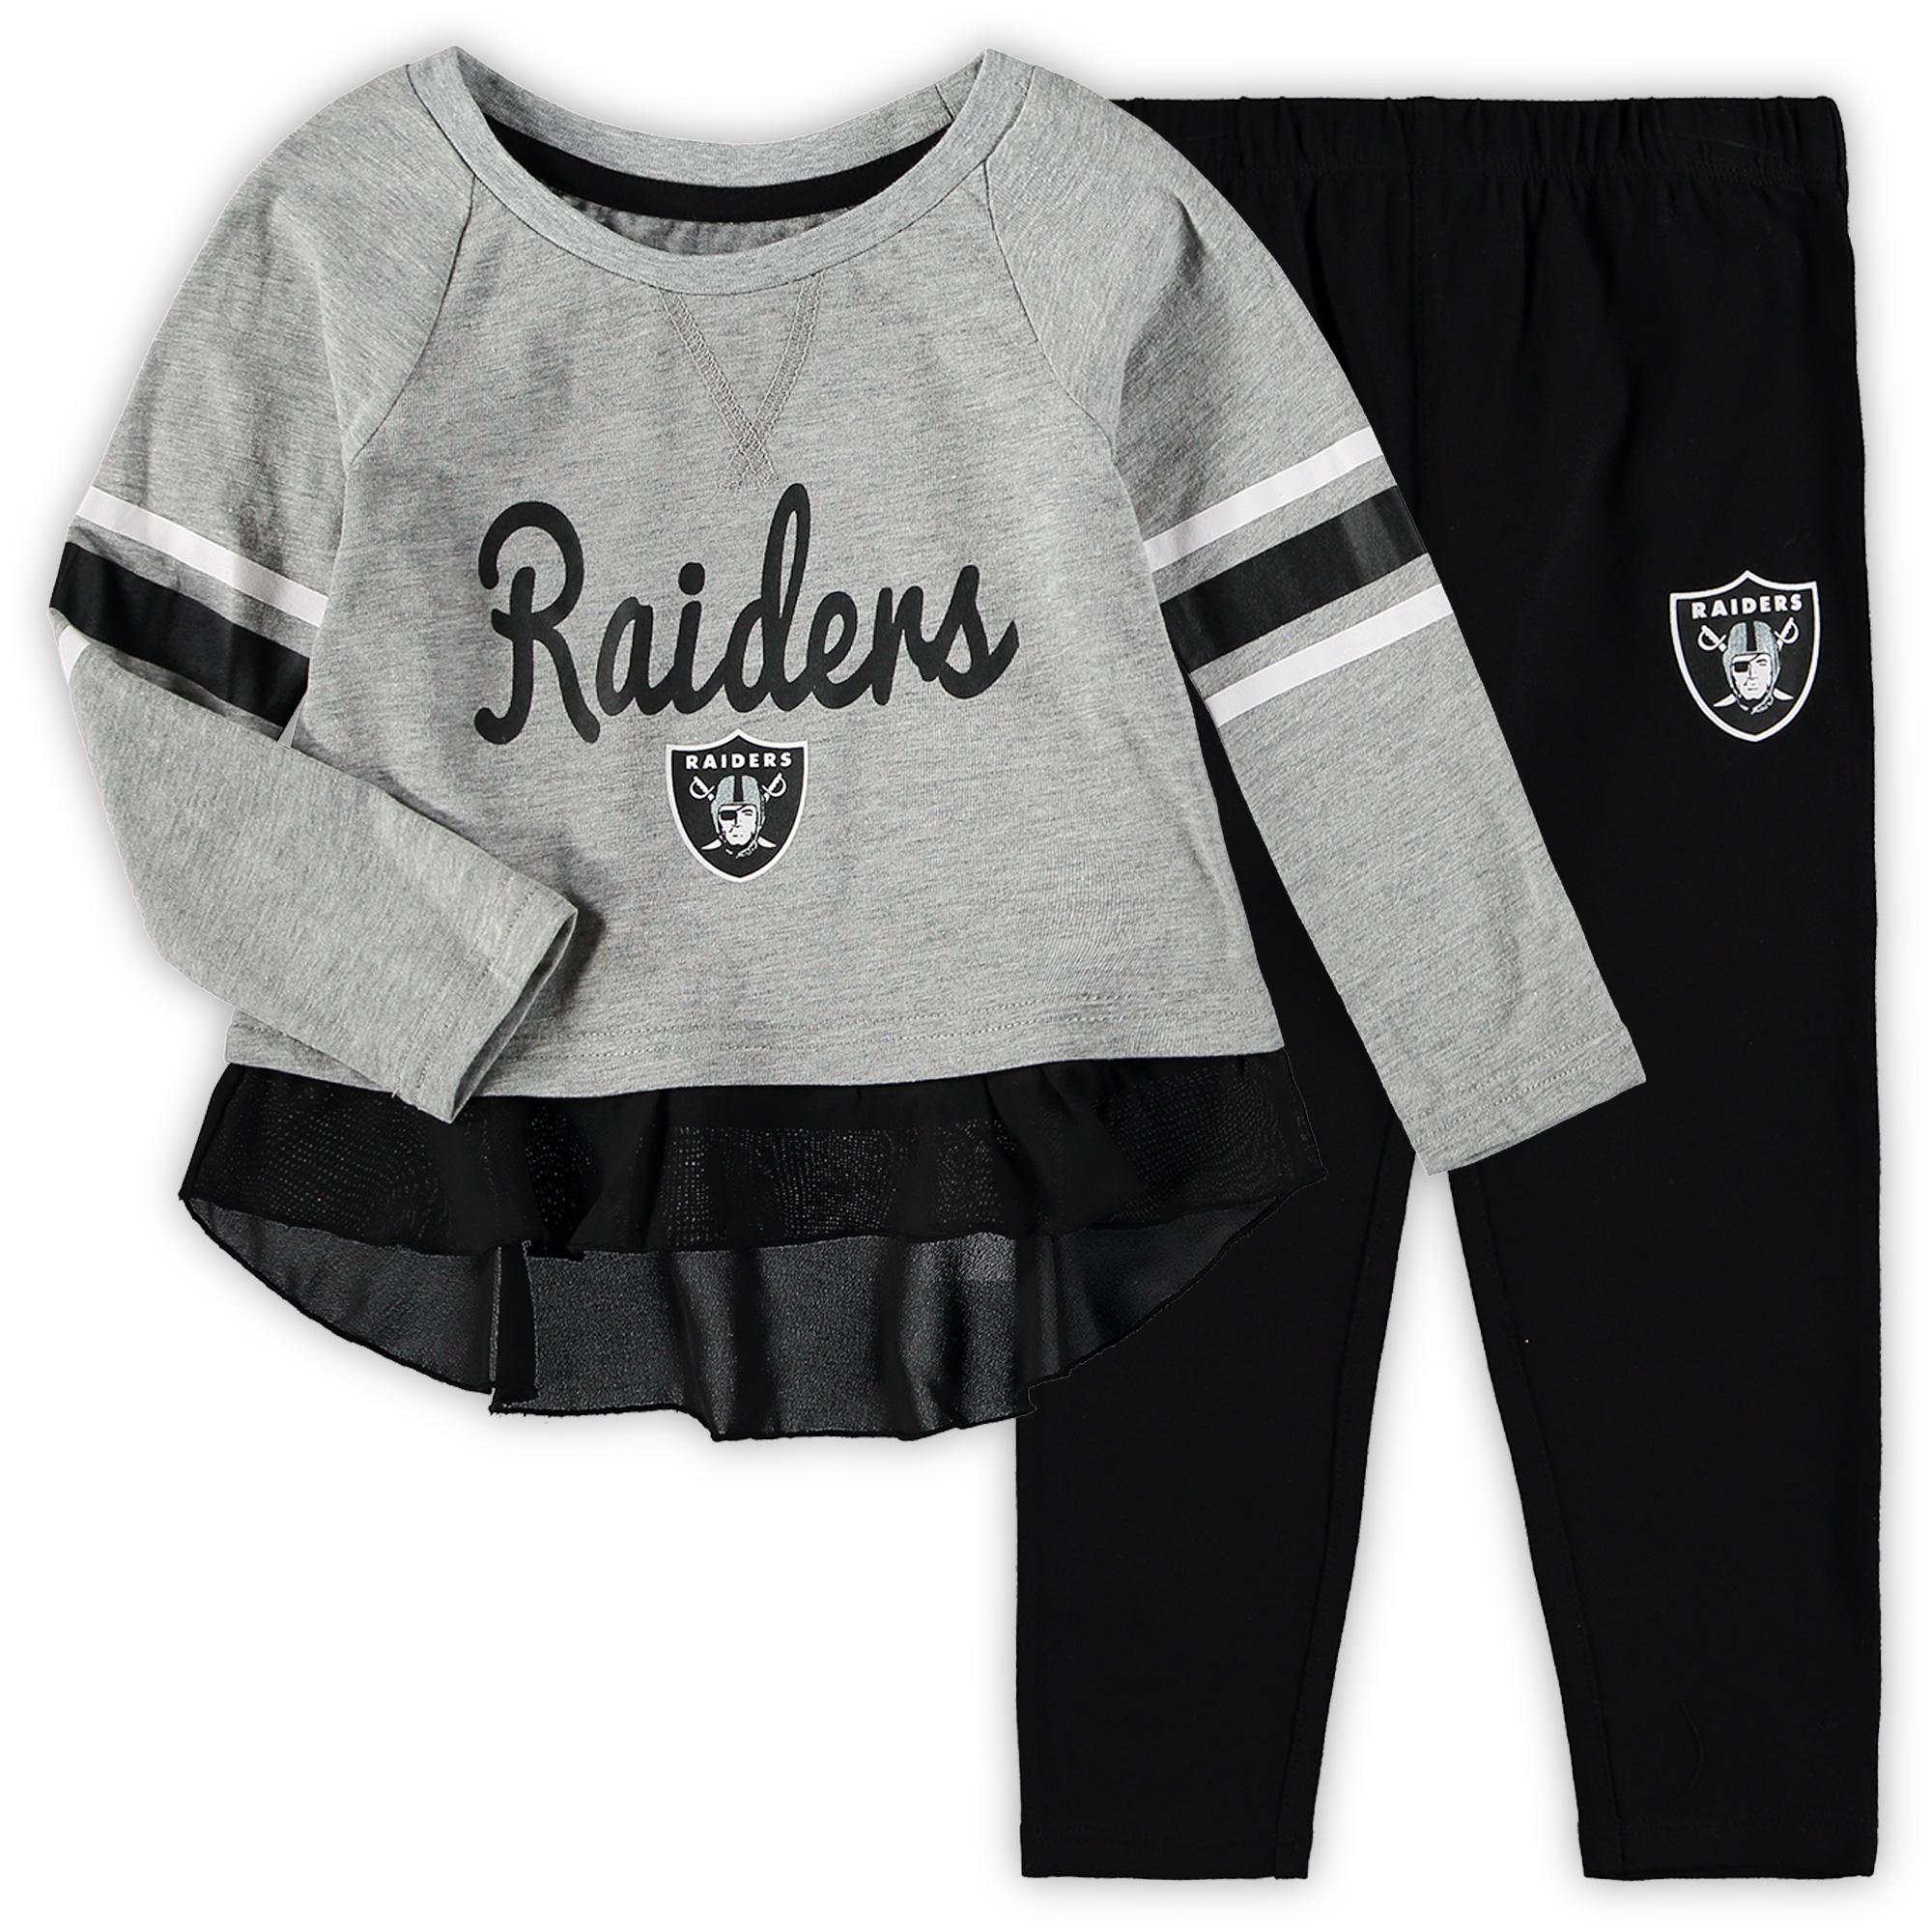 Oakland Raiders Girls Toddler Mini Formation Set - Gray/Black